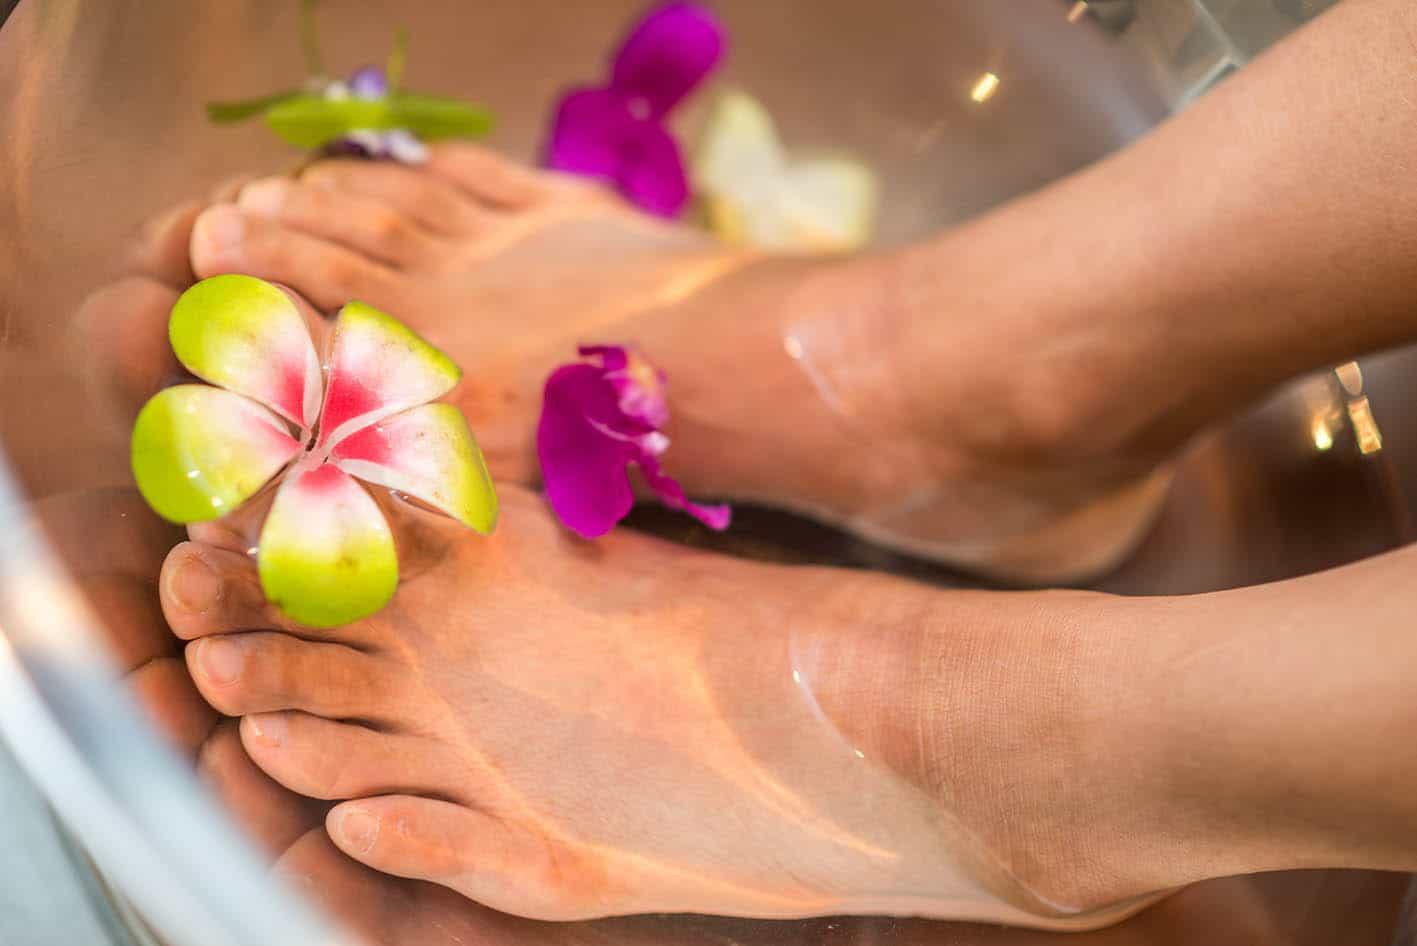 soin calluspeeling des pieds